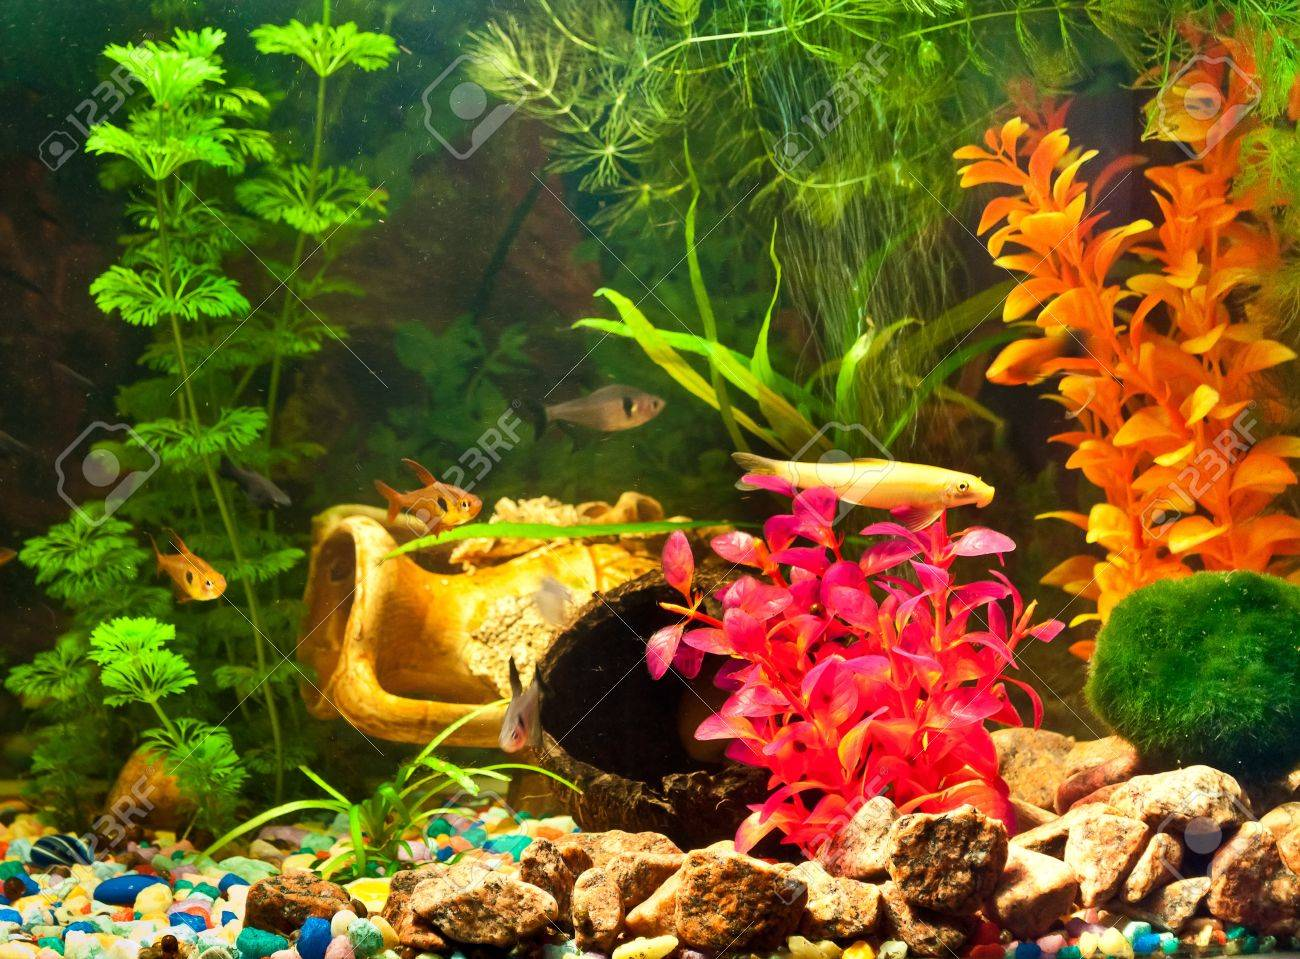 Aquarium with plants and fish - 12044315